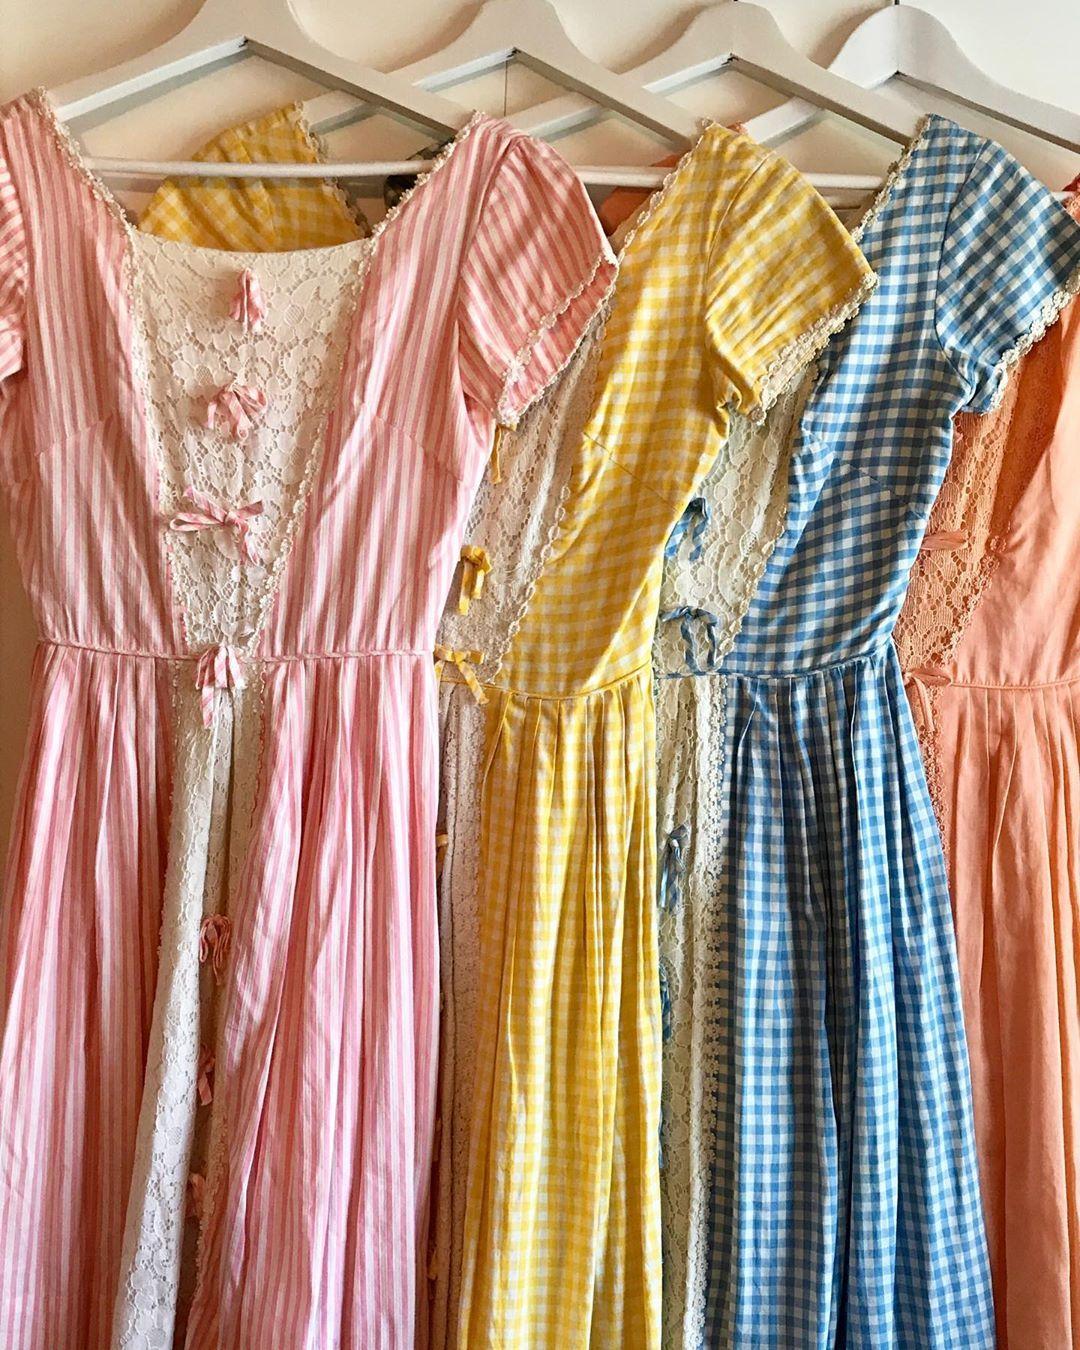 Gefallt 47 Mal 8 Kommentare Vici Vicilovescolor Auf Instagram I Have Today S Dress In Several Colors In 2020 Pretty Dresses Vintage Dresses Retro Dress